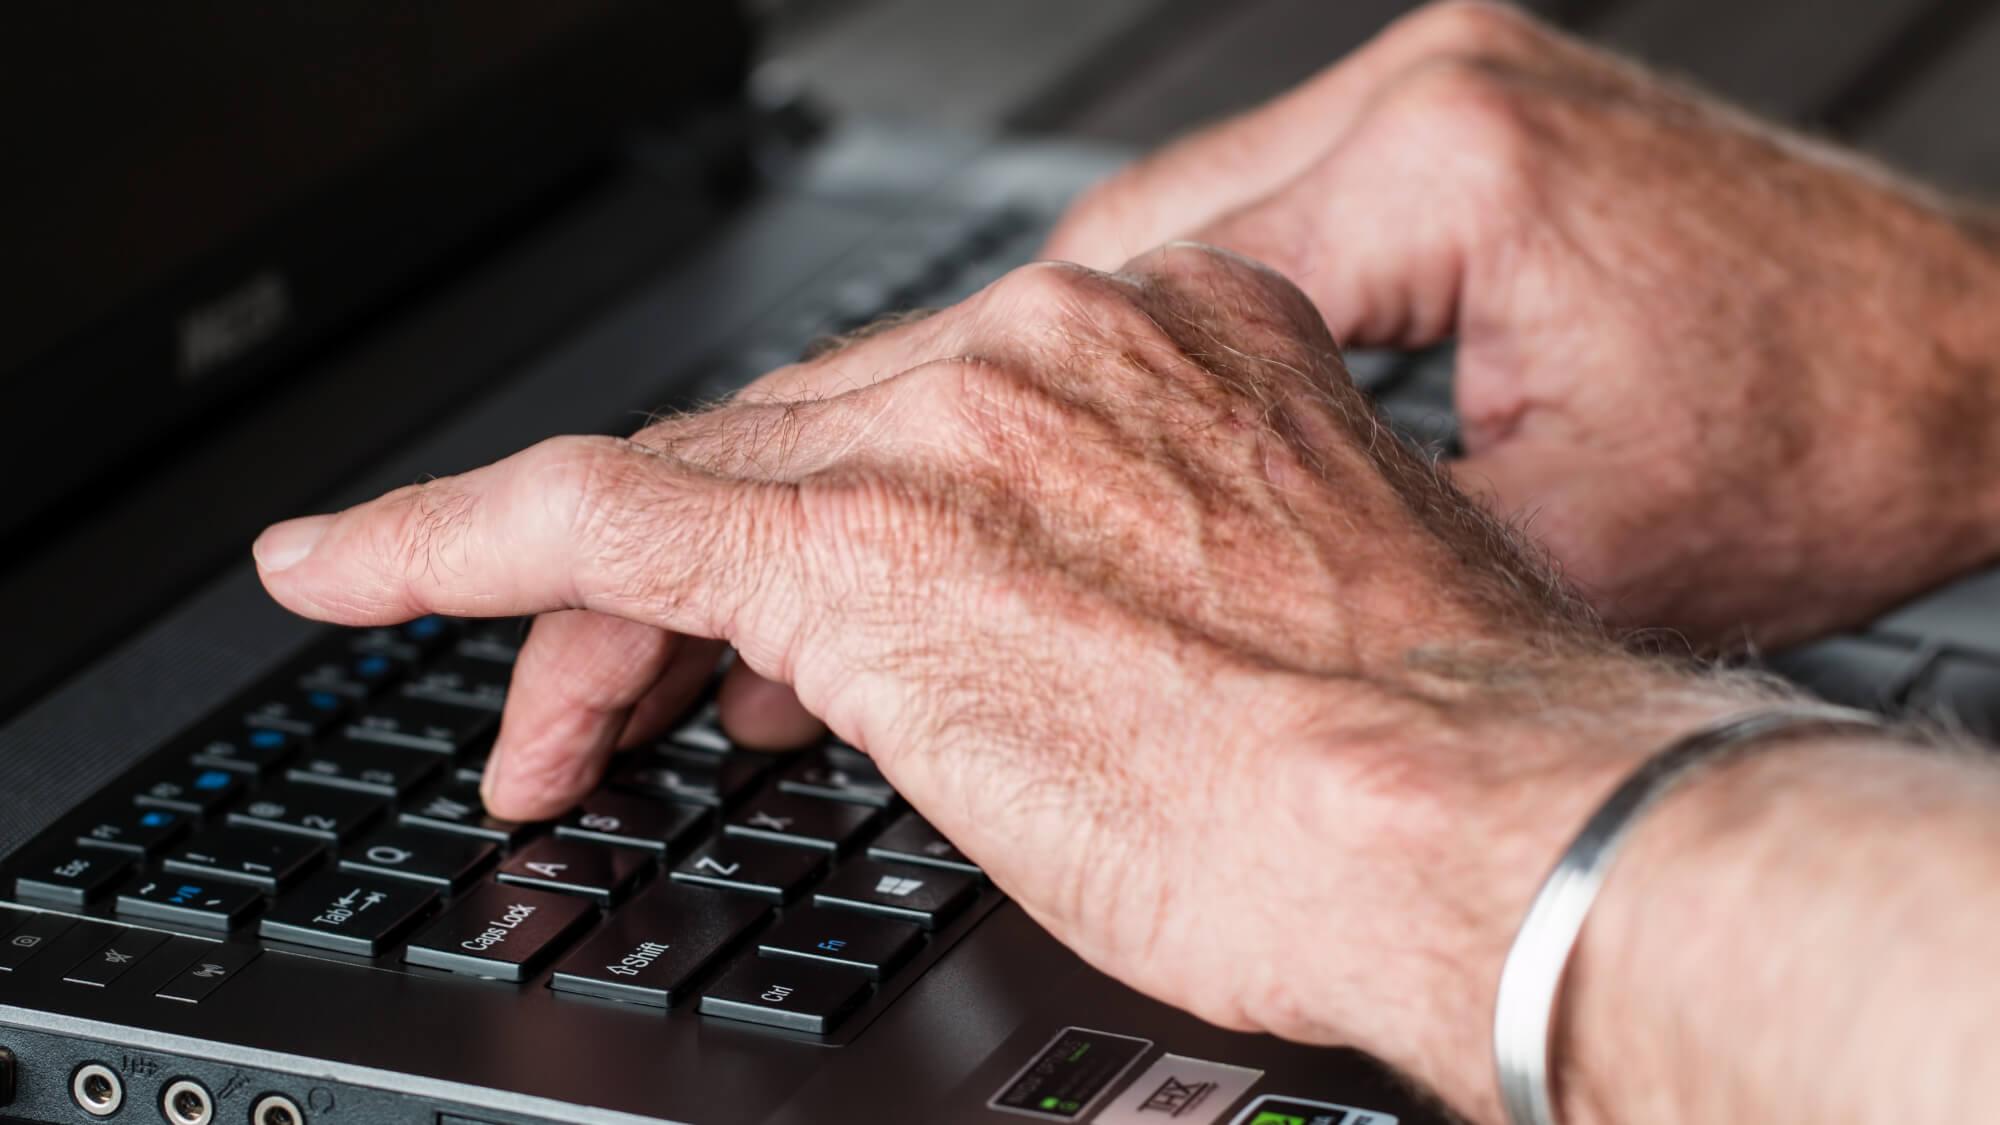 elderly hands typing on laptop